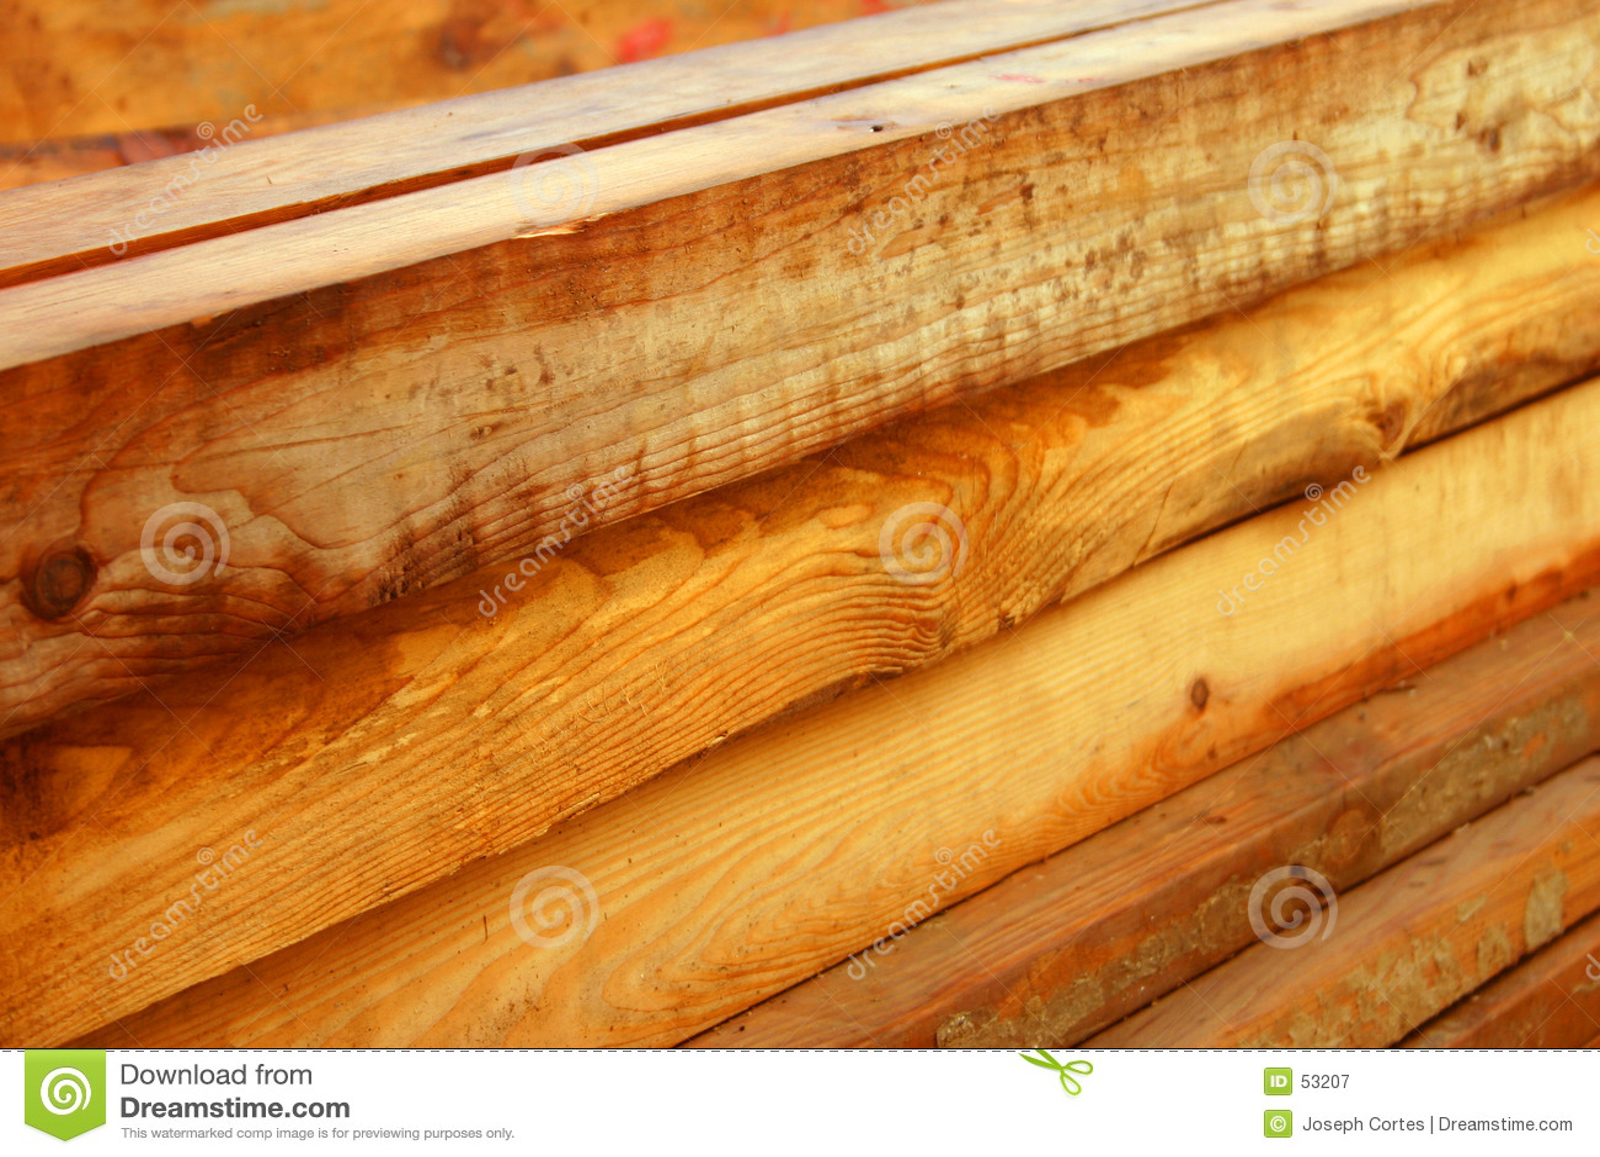 Wood Beams Royalty Free Stock Photography Image 53207